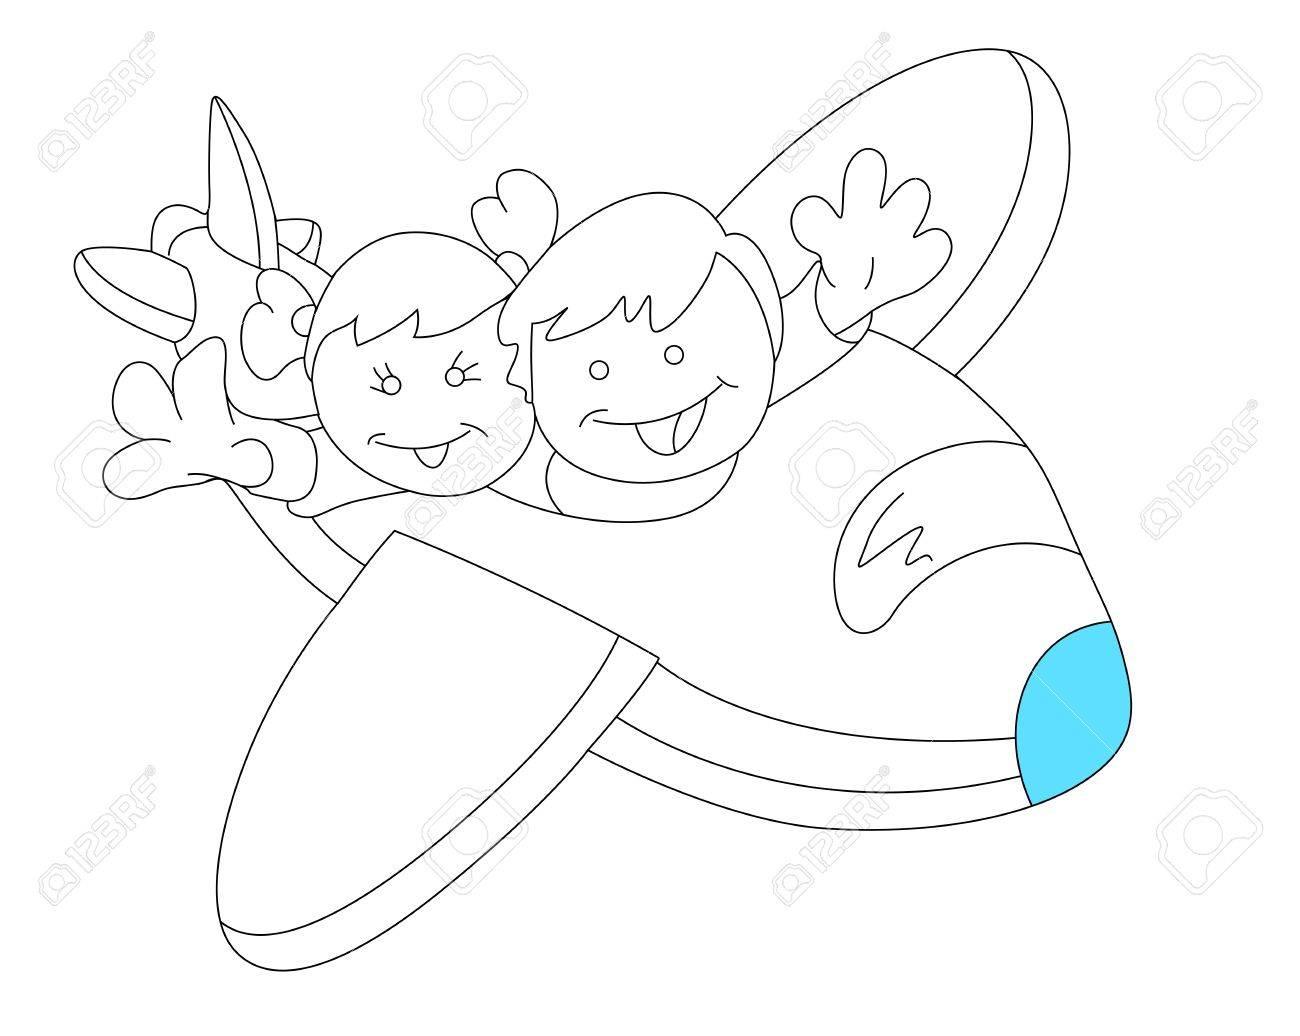 happy kids in plane sketch stock vector 13052147 - Sketch Images For Kids